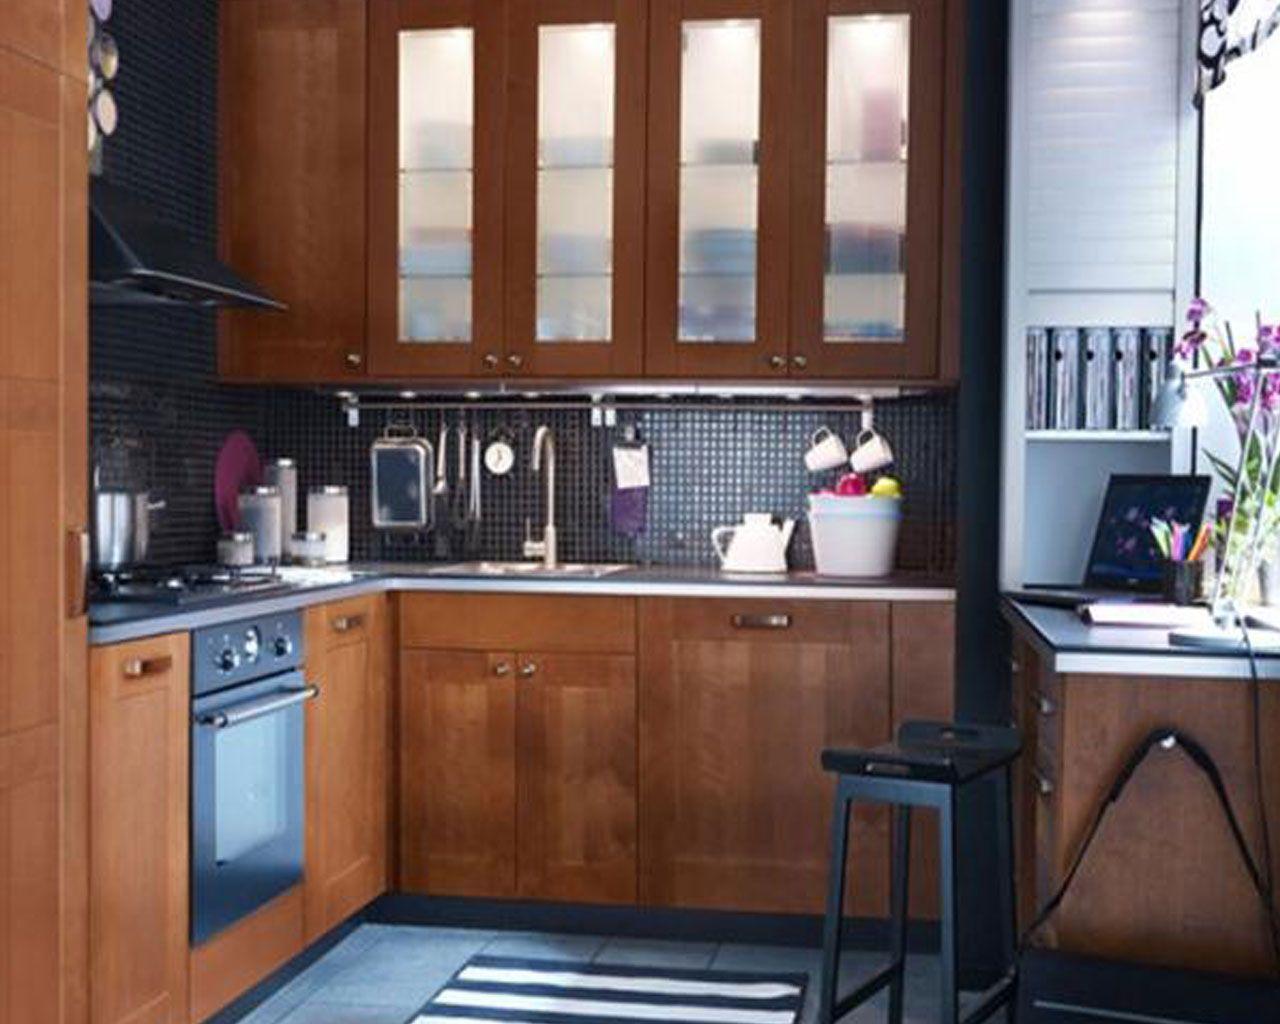 Ikeakitchendesigneratlantahiplyfe 1280×1024 Pixels Captivating Kitchen Cabinet Design Ikea Design Inspiration